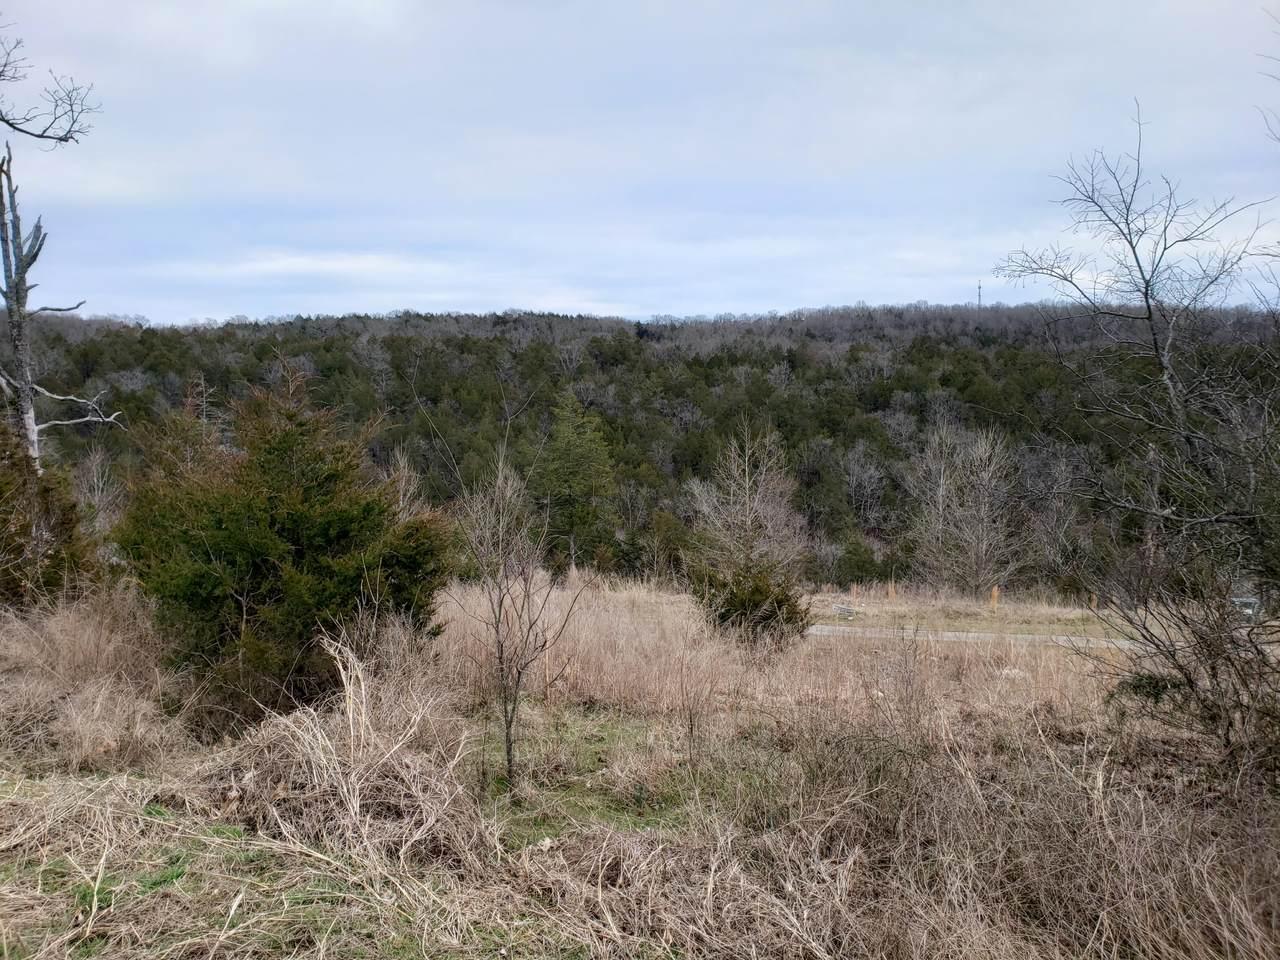 000-Lot 200r Country Ridge Way - Photo 1